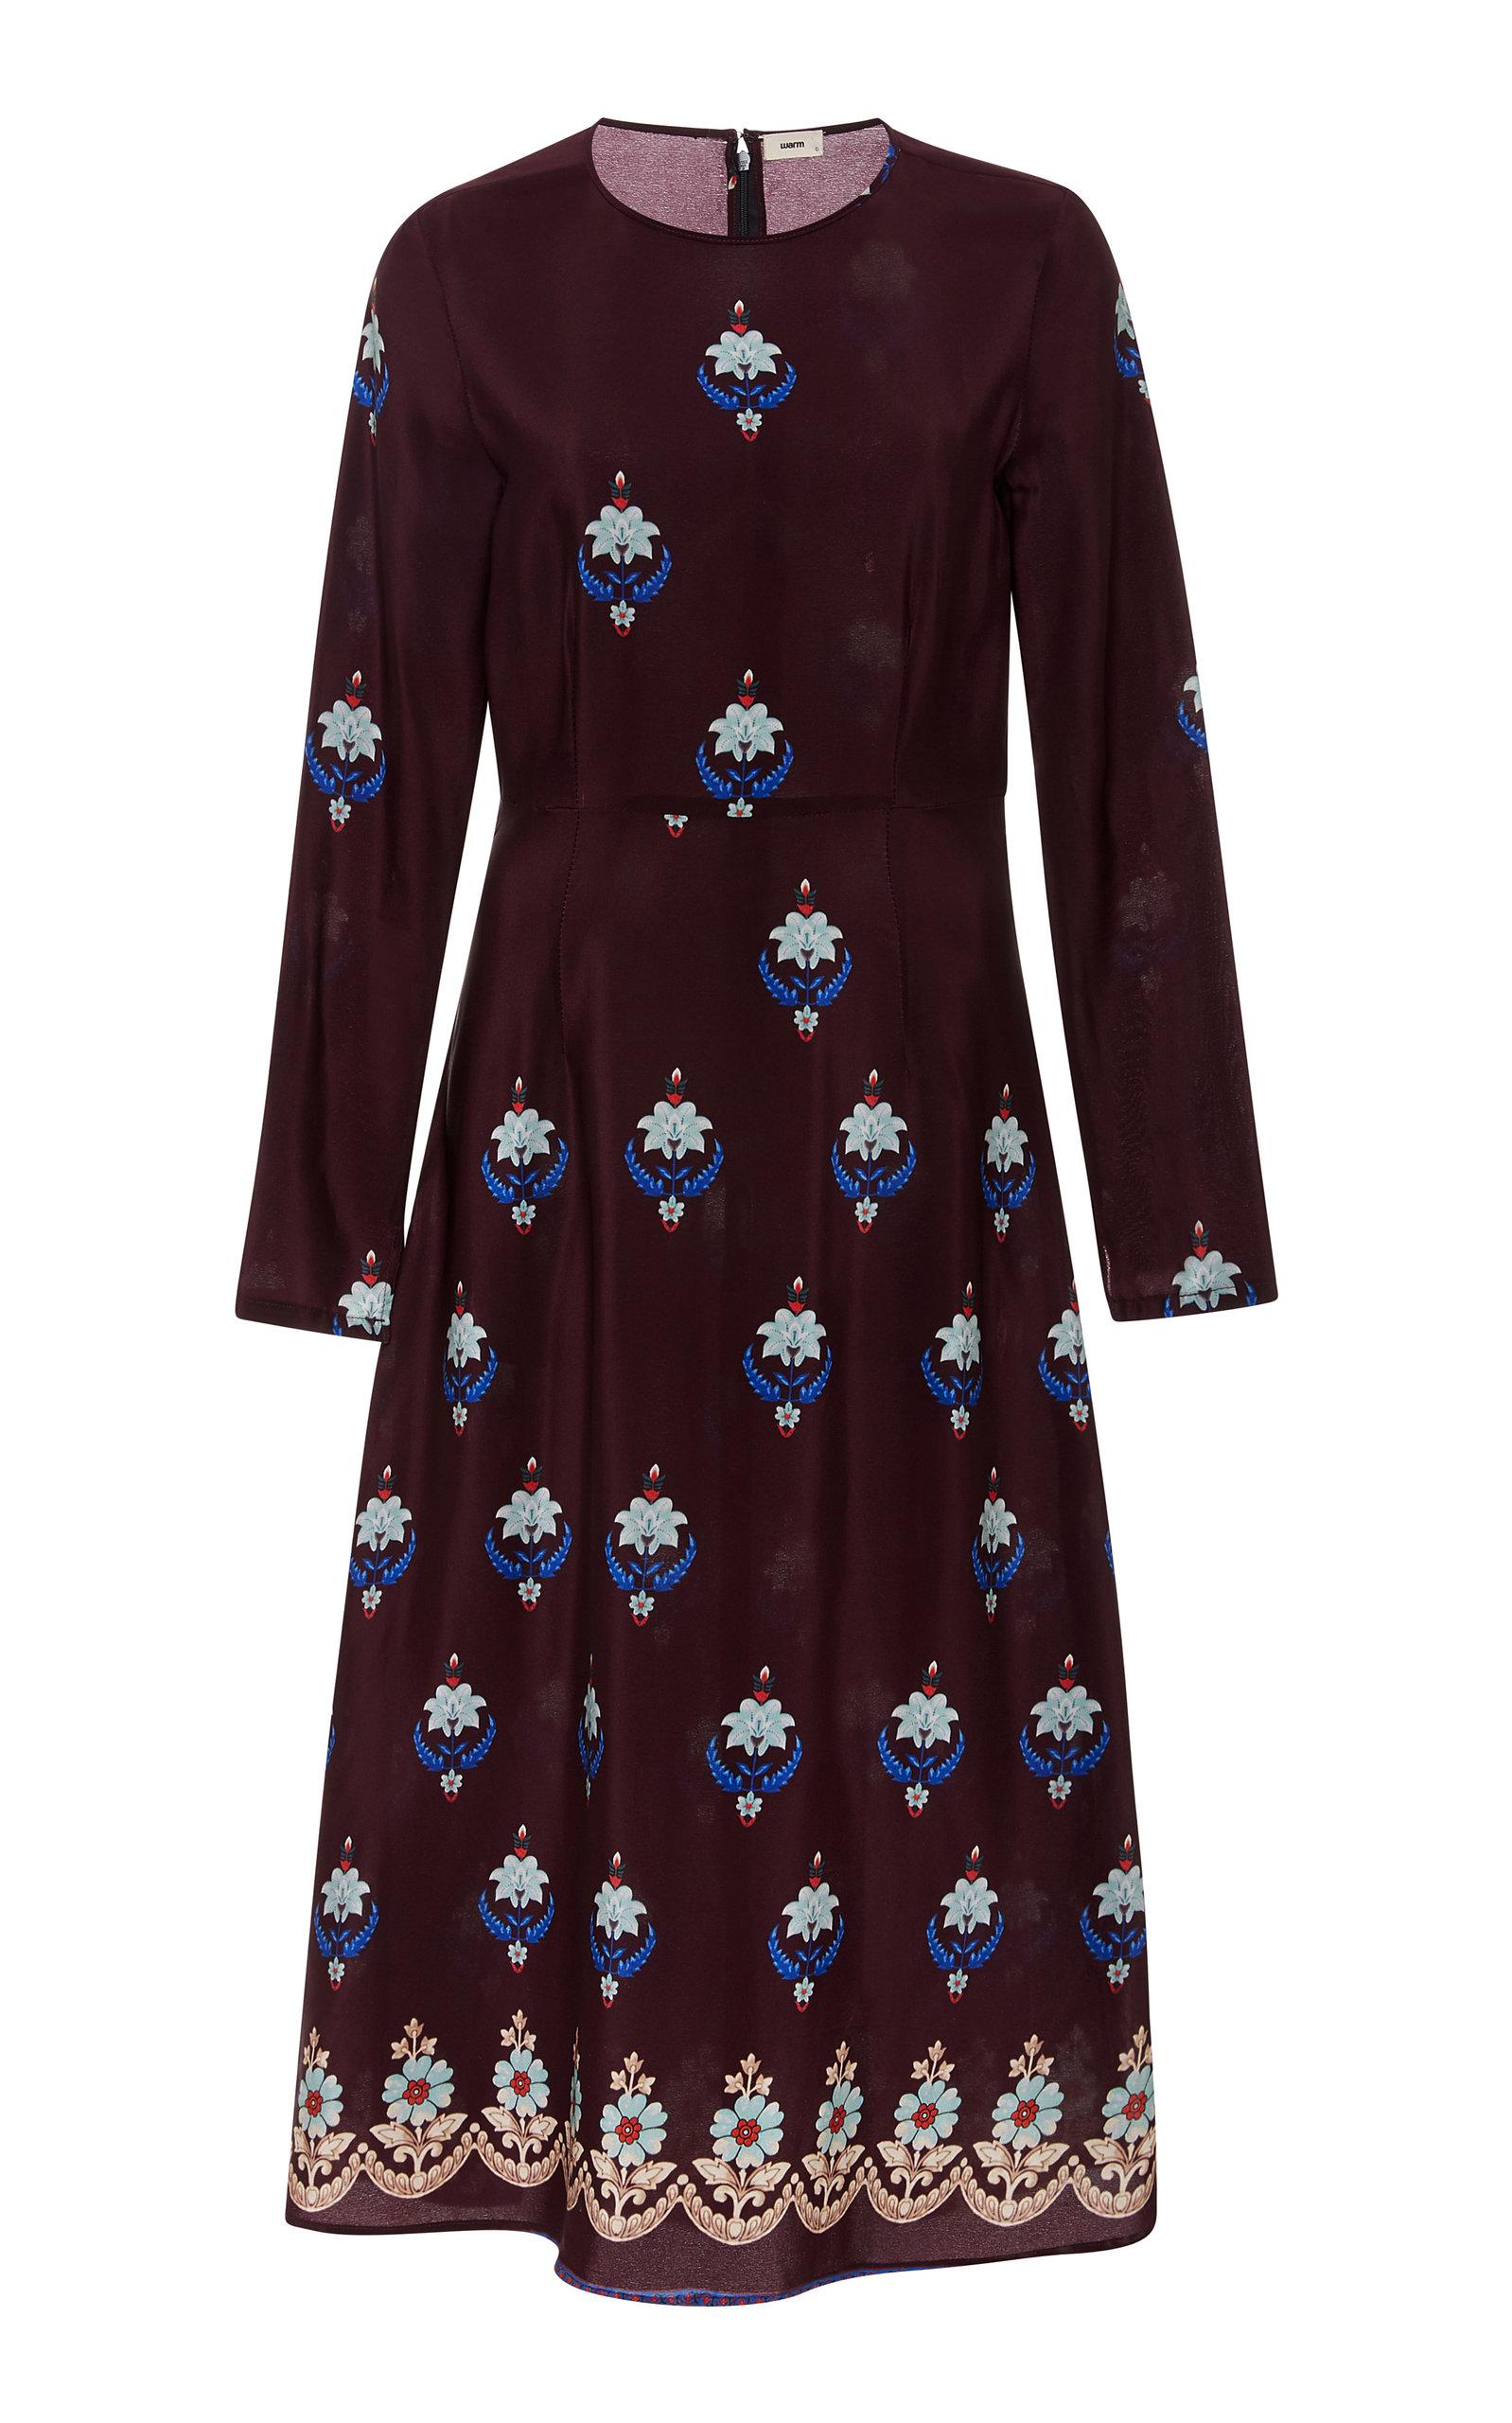 POPPY PRINTED DRESS